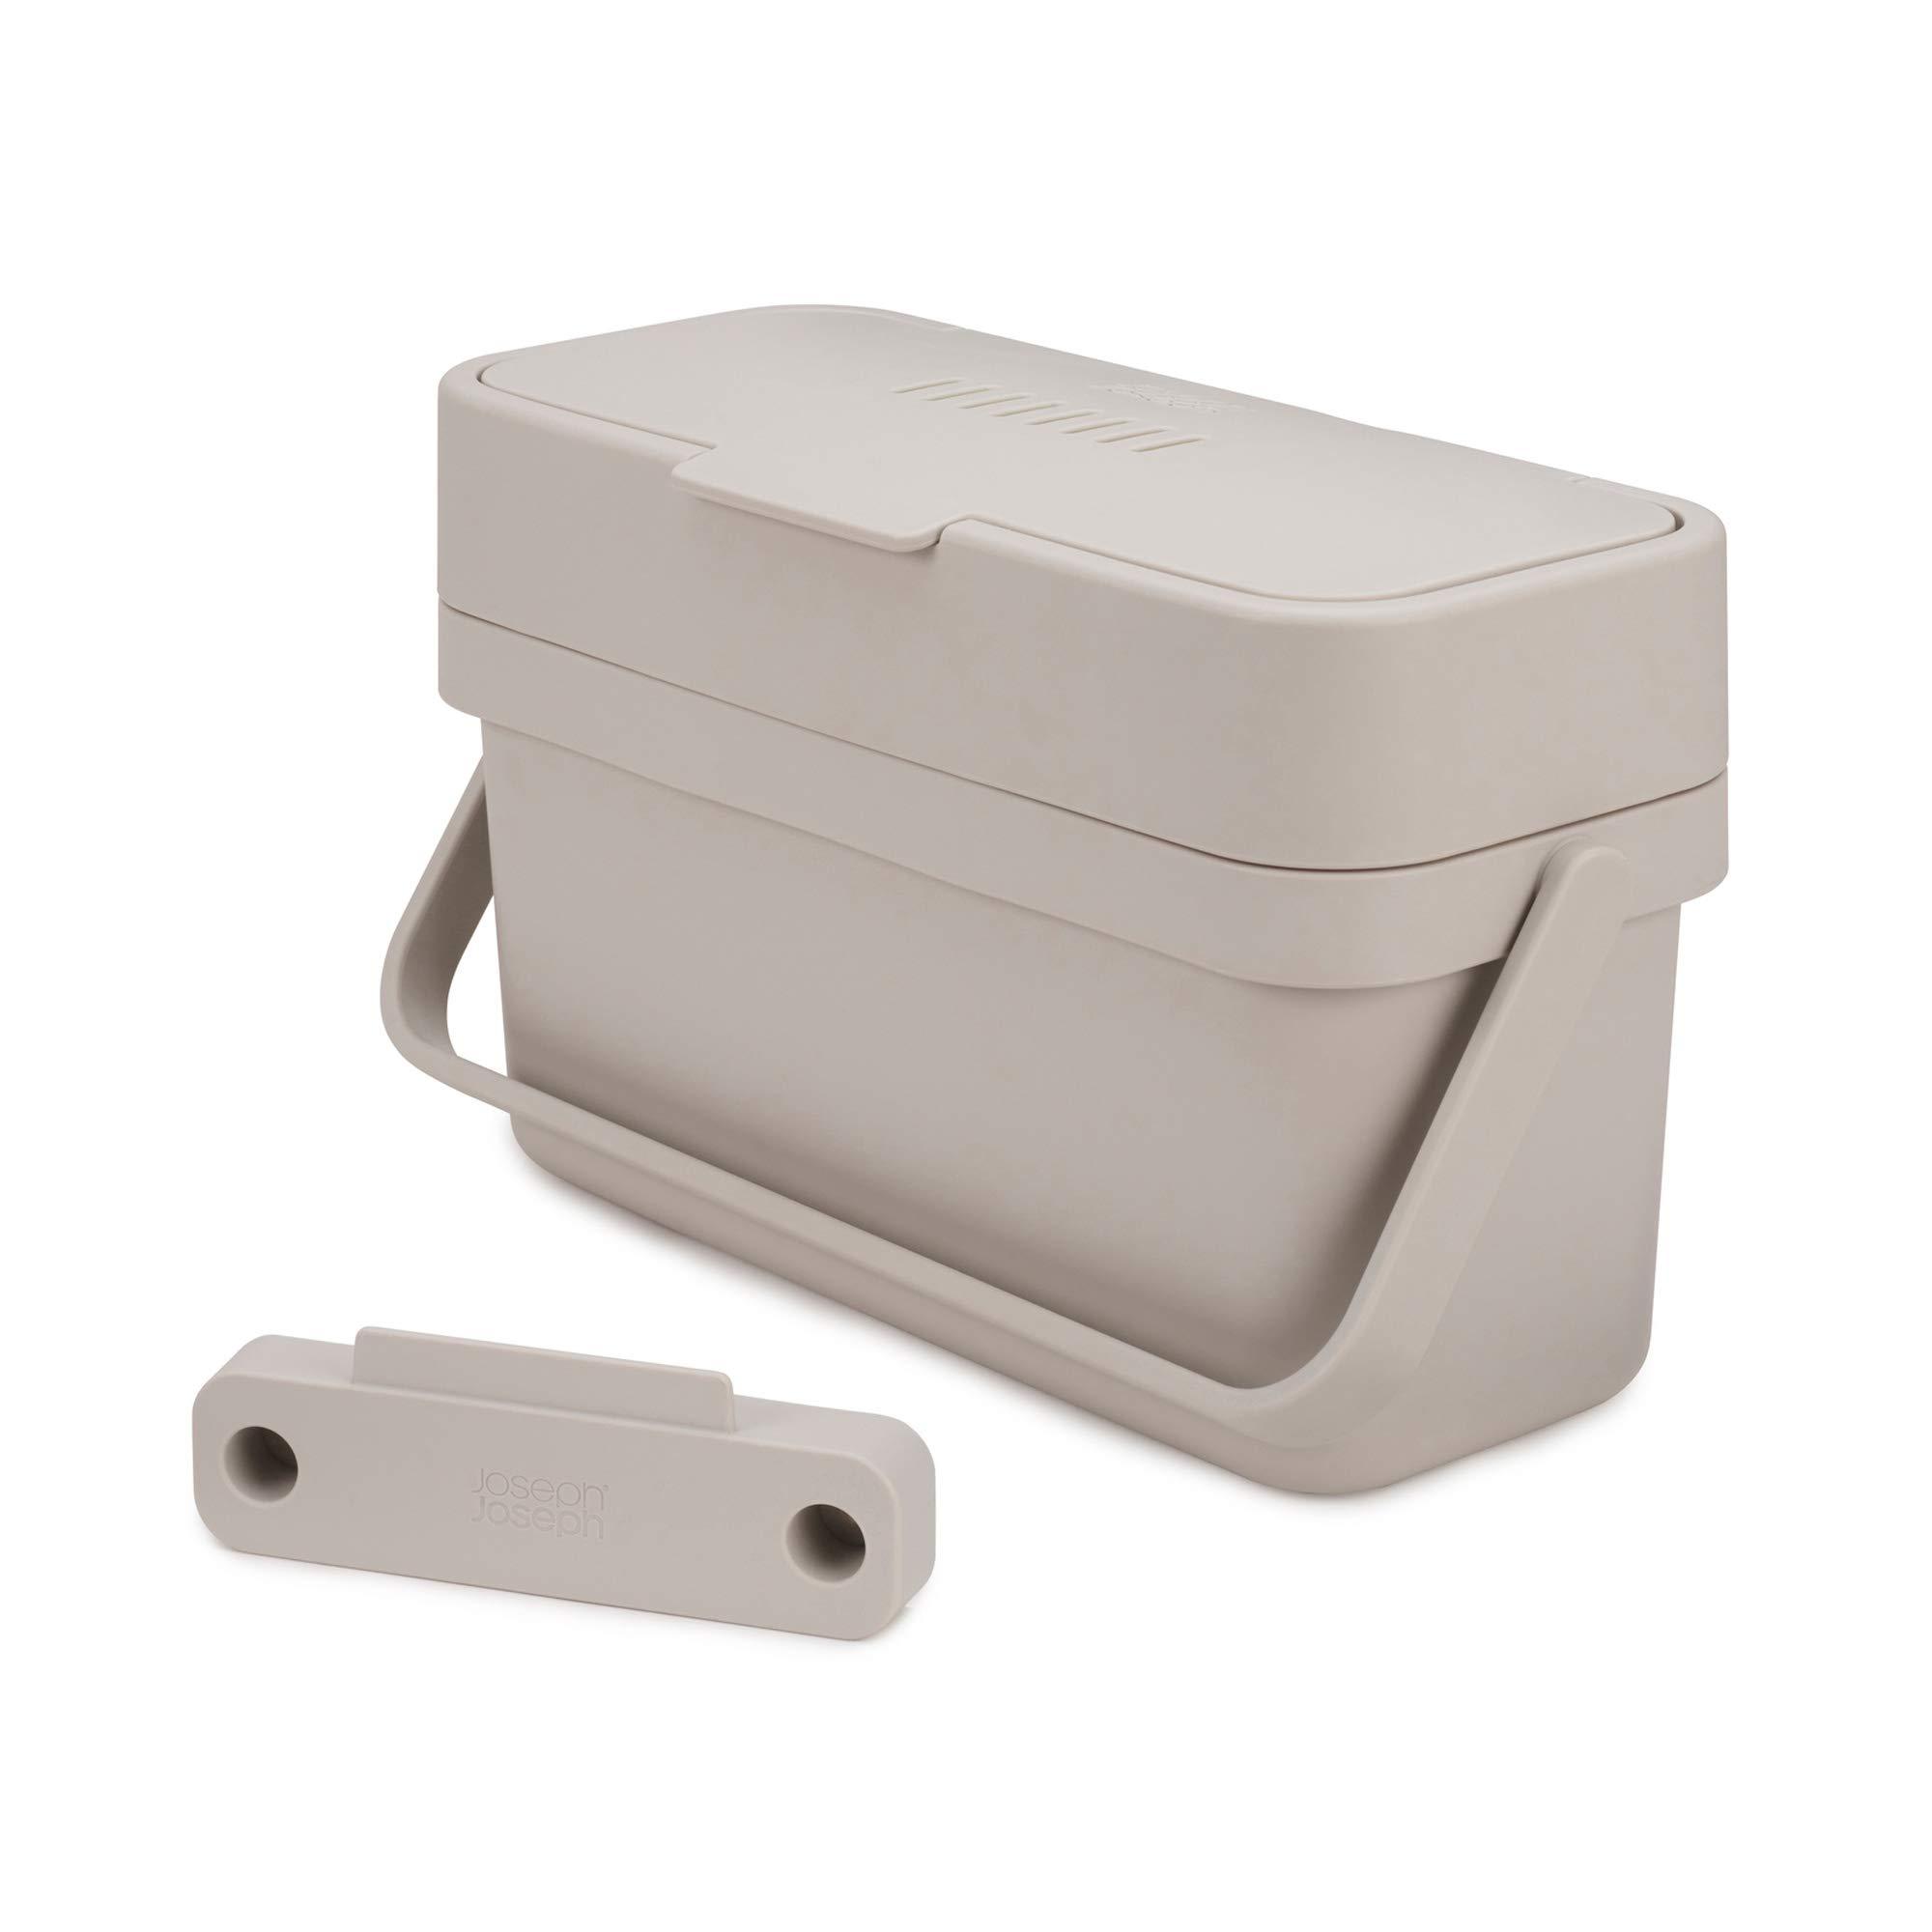 Joseph Joseph 30046 Compo Easy-Fill Compost Bin Food Waste Caddy with Adjustable Air Vent, 1 gallon / 4 liters, Stone by Joseph Joseph